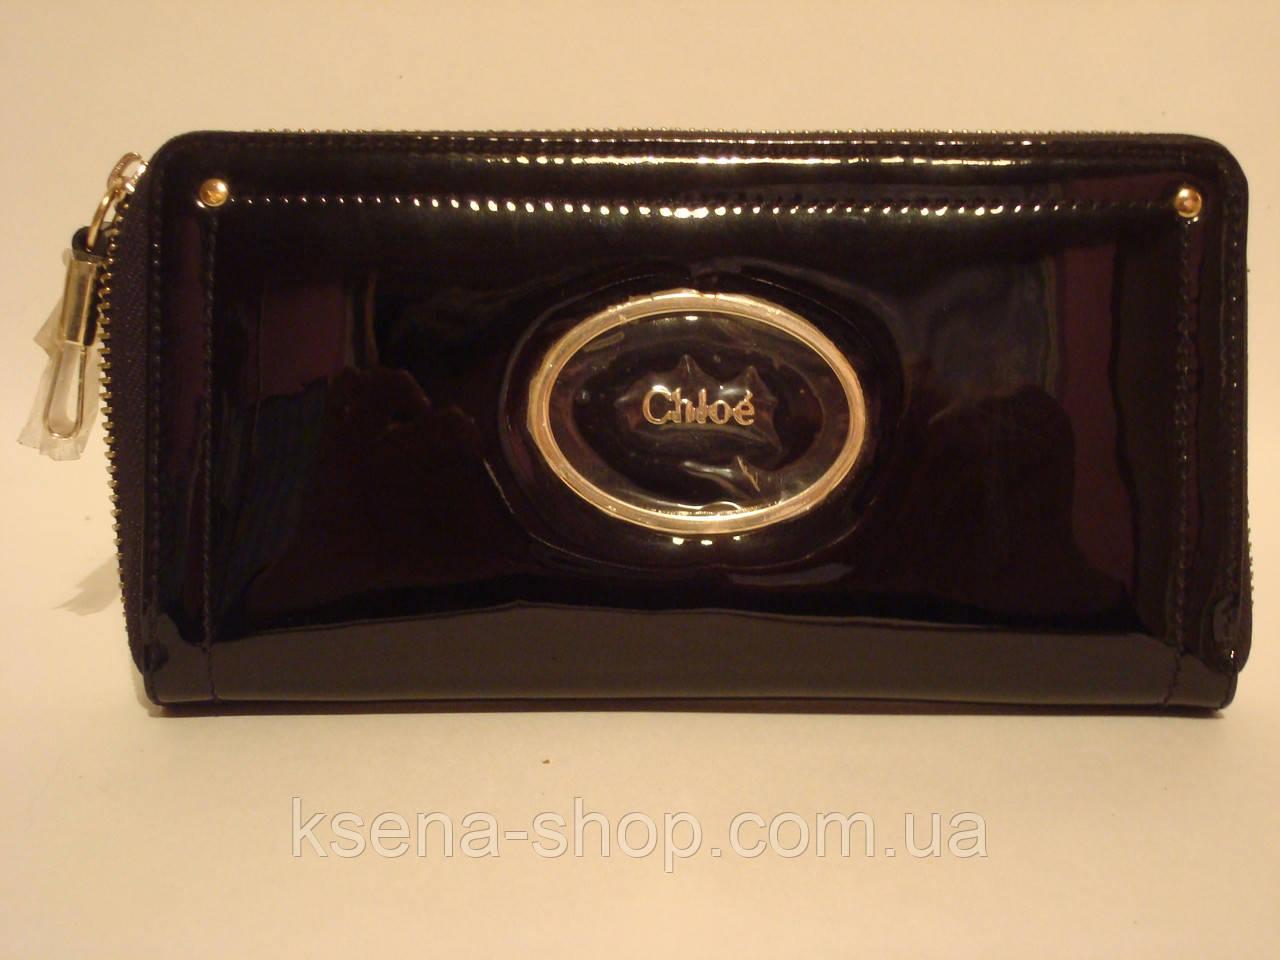 f858d31b9db7 Женский кошелек Chloe-1, цена 430 грн., купить в Одессе — Prom.ua ...